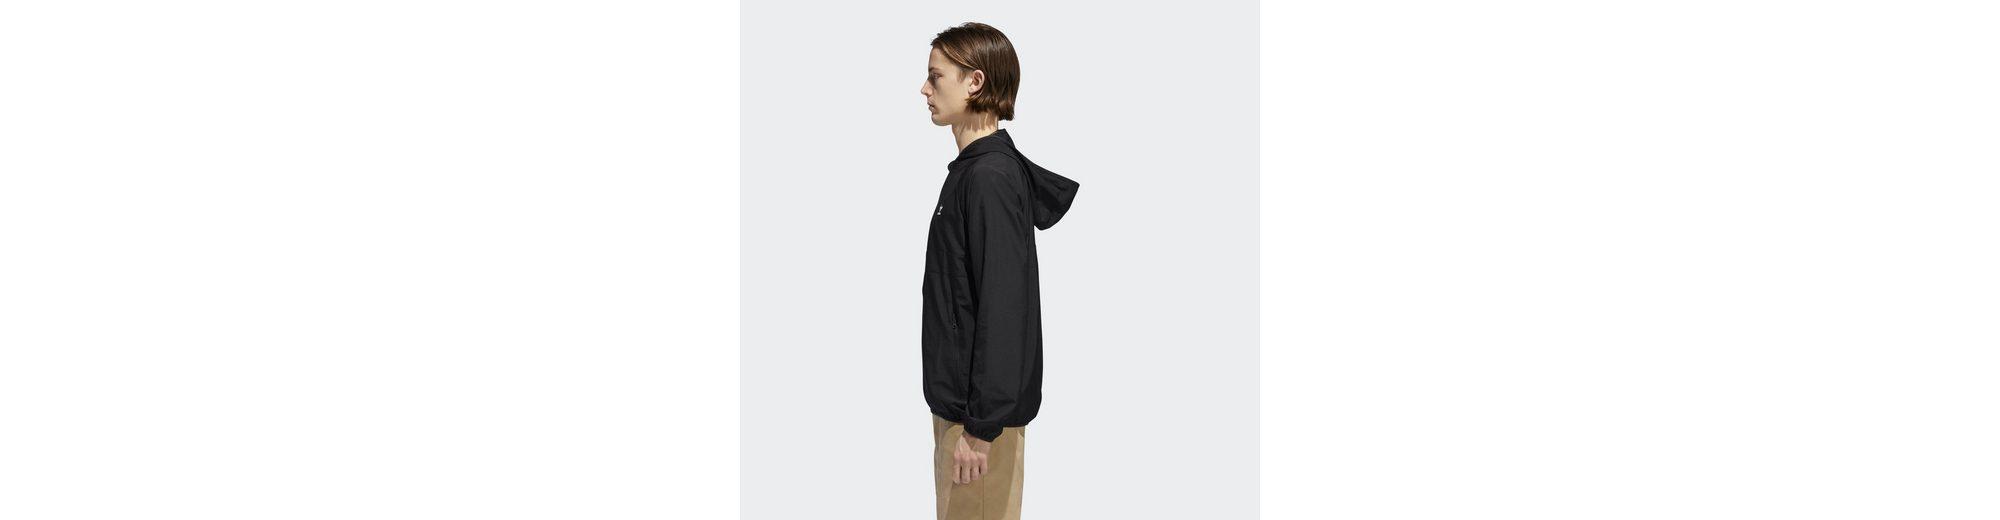 adidas Originals Funktionsjacke Blackbird Windbreaker Rabatt 2018 PO8zH0j6w